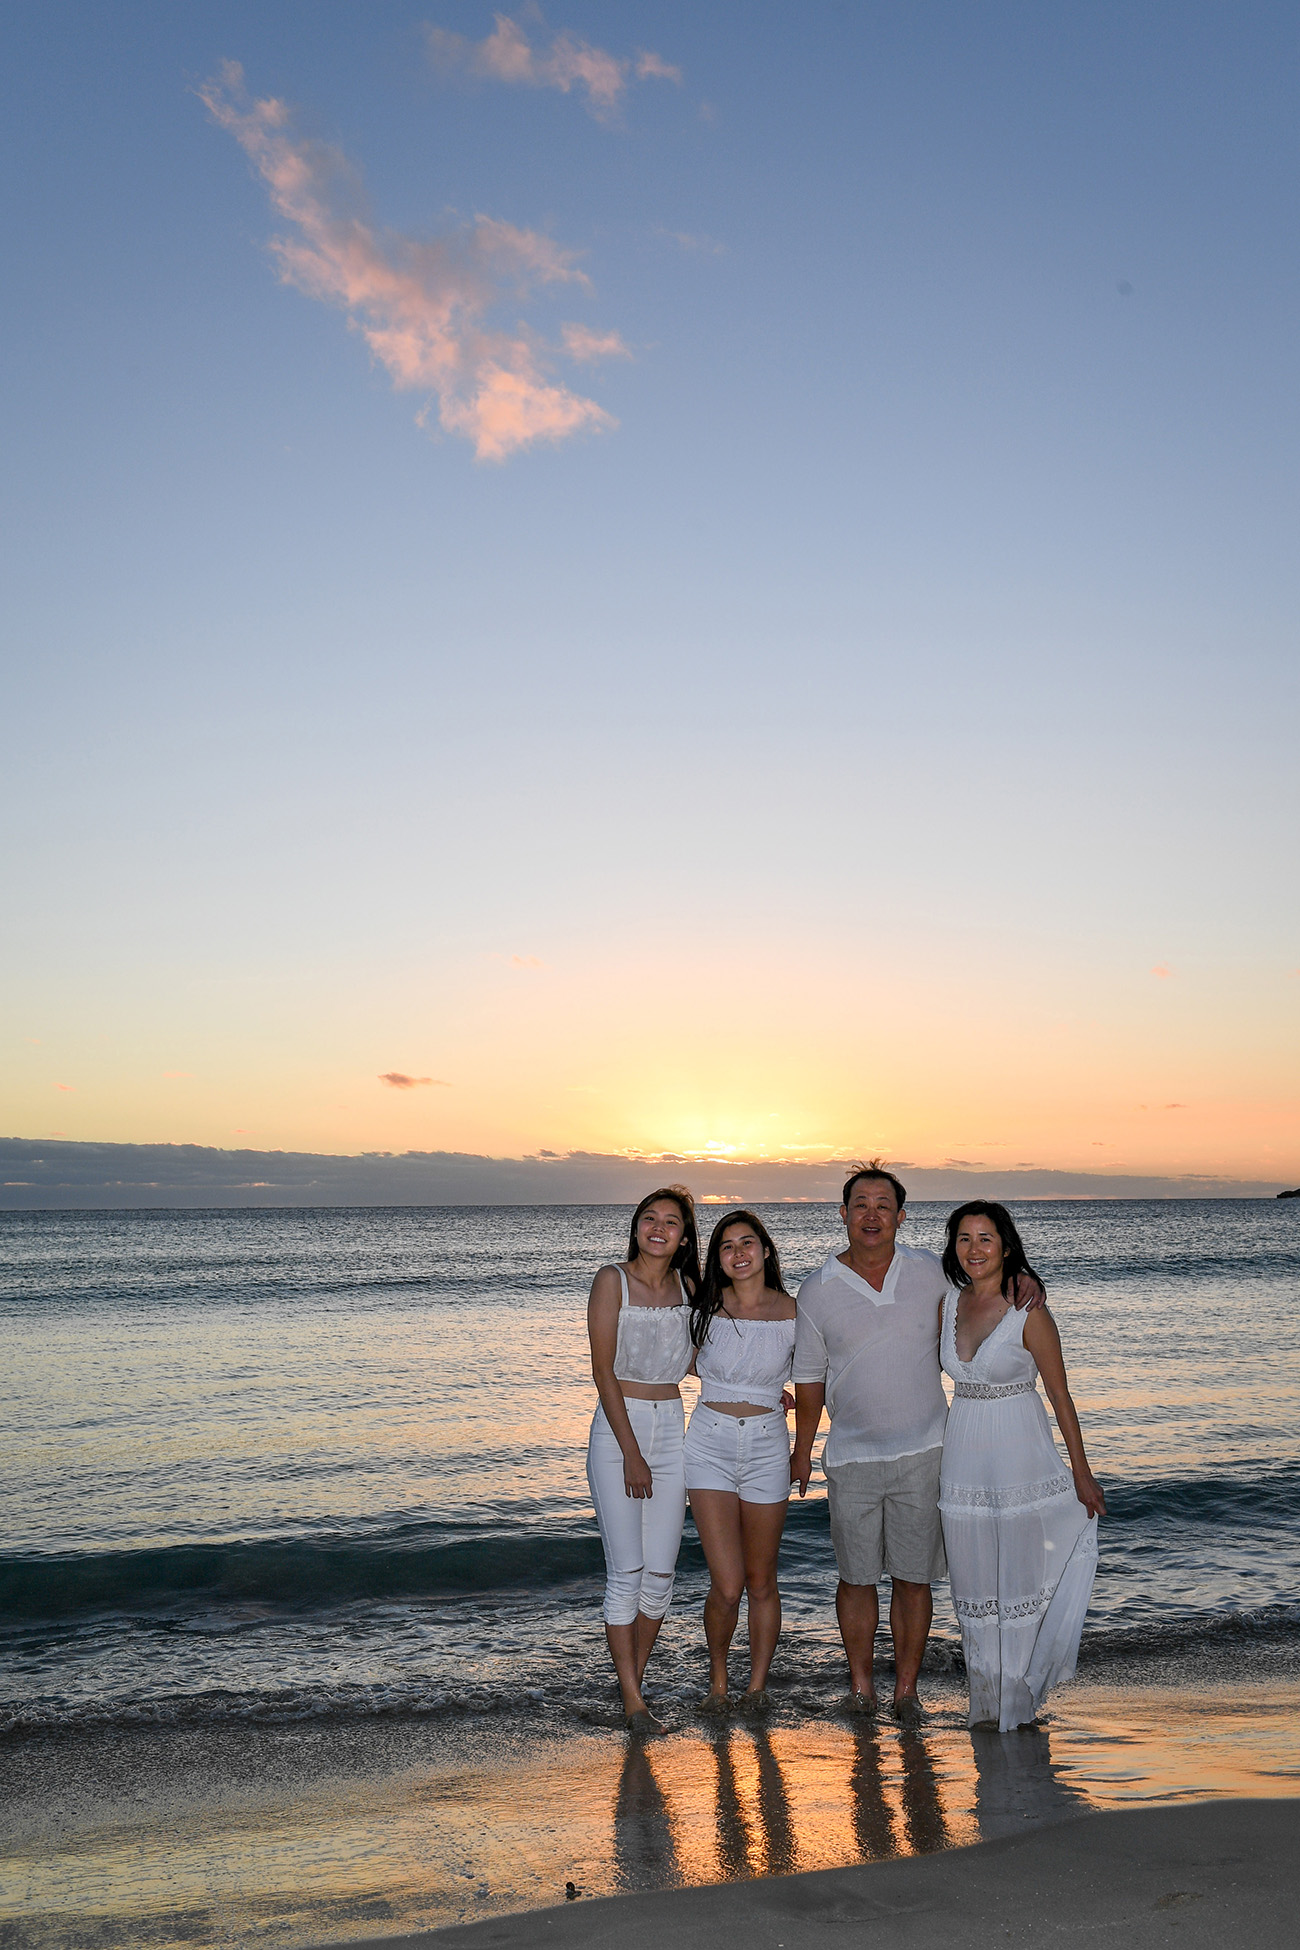 The family cuddles against the setting Fiji sun